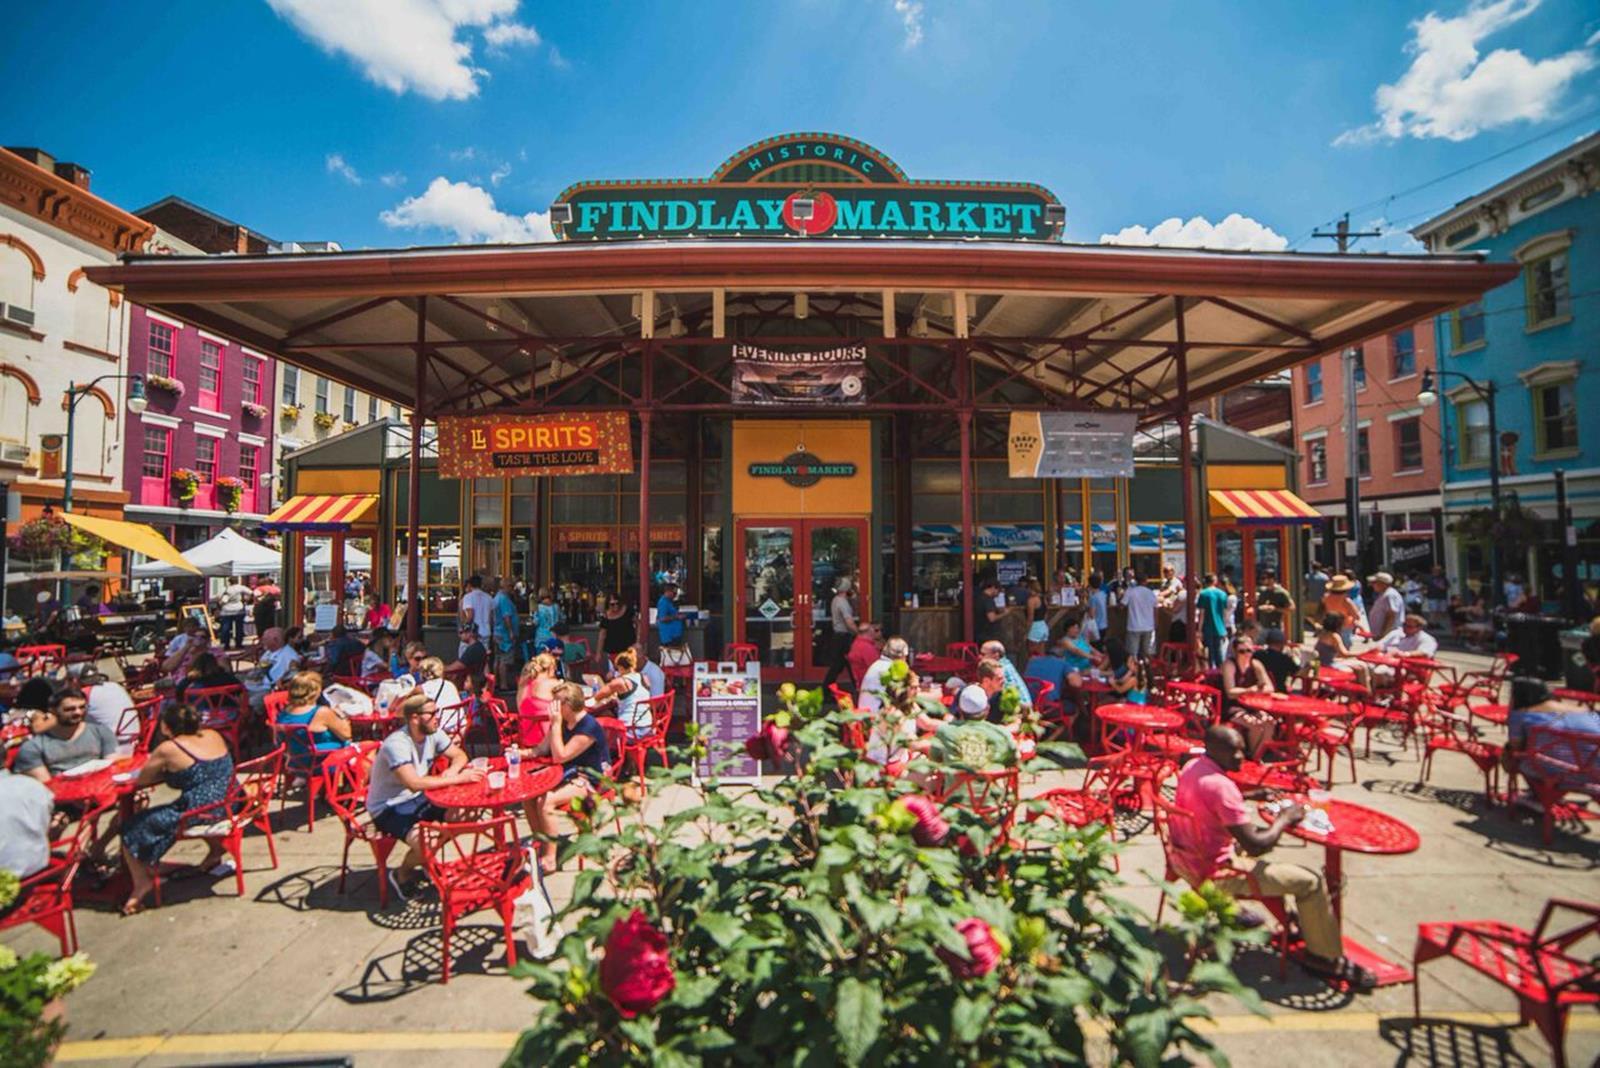 Cincinnati Findlay Farmers Market